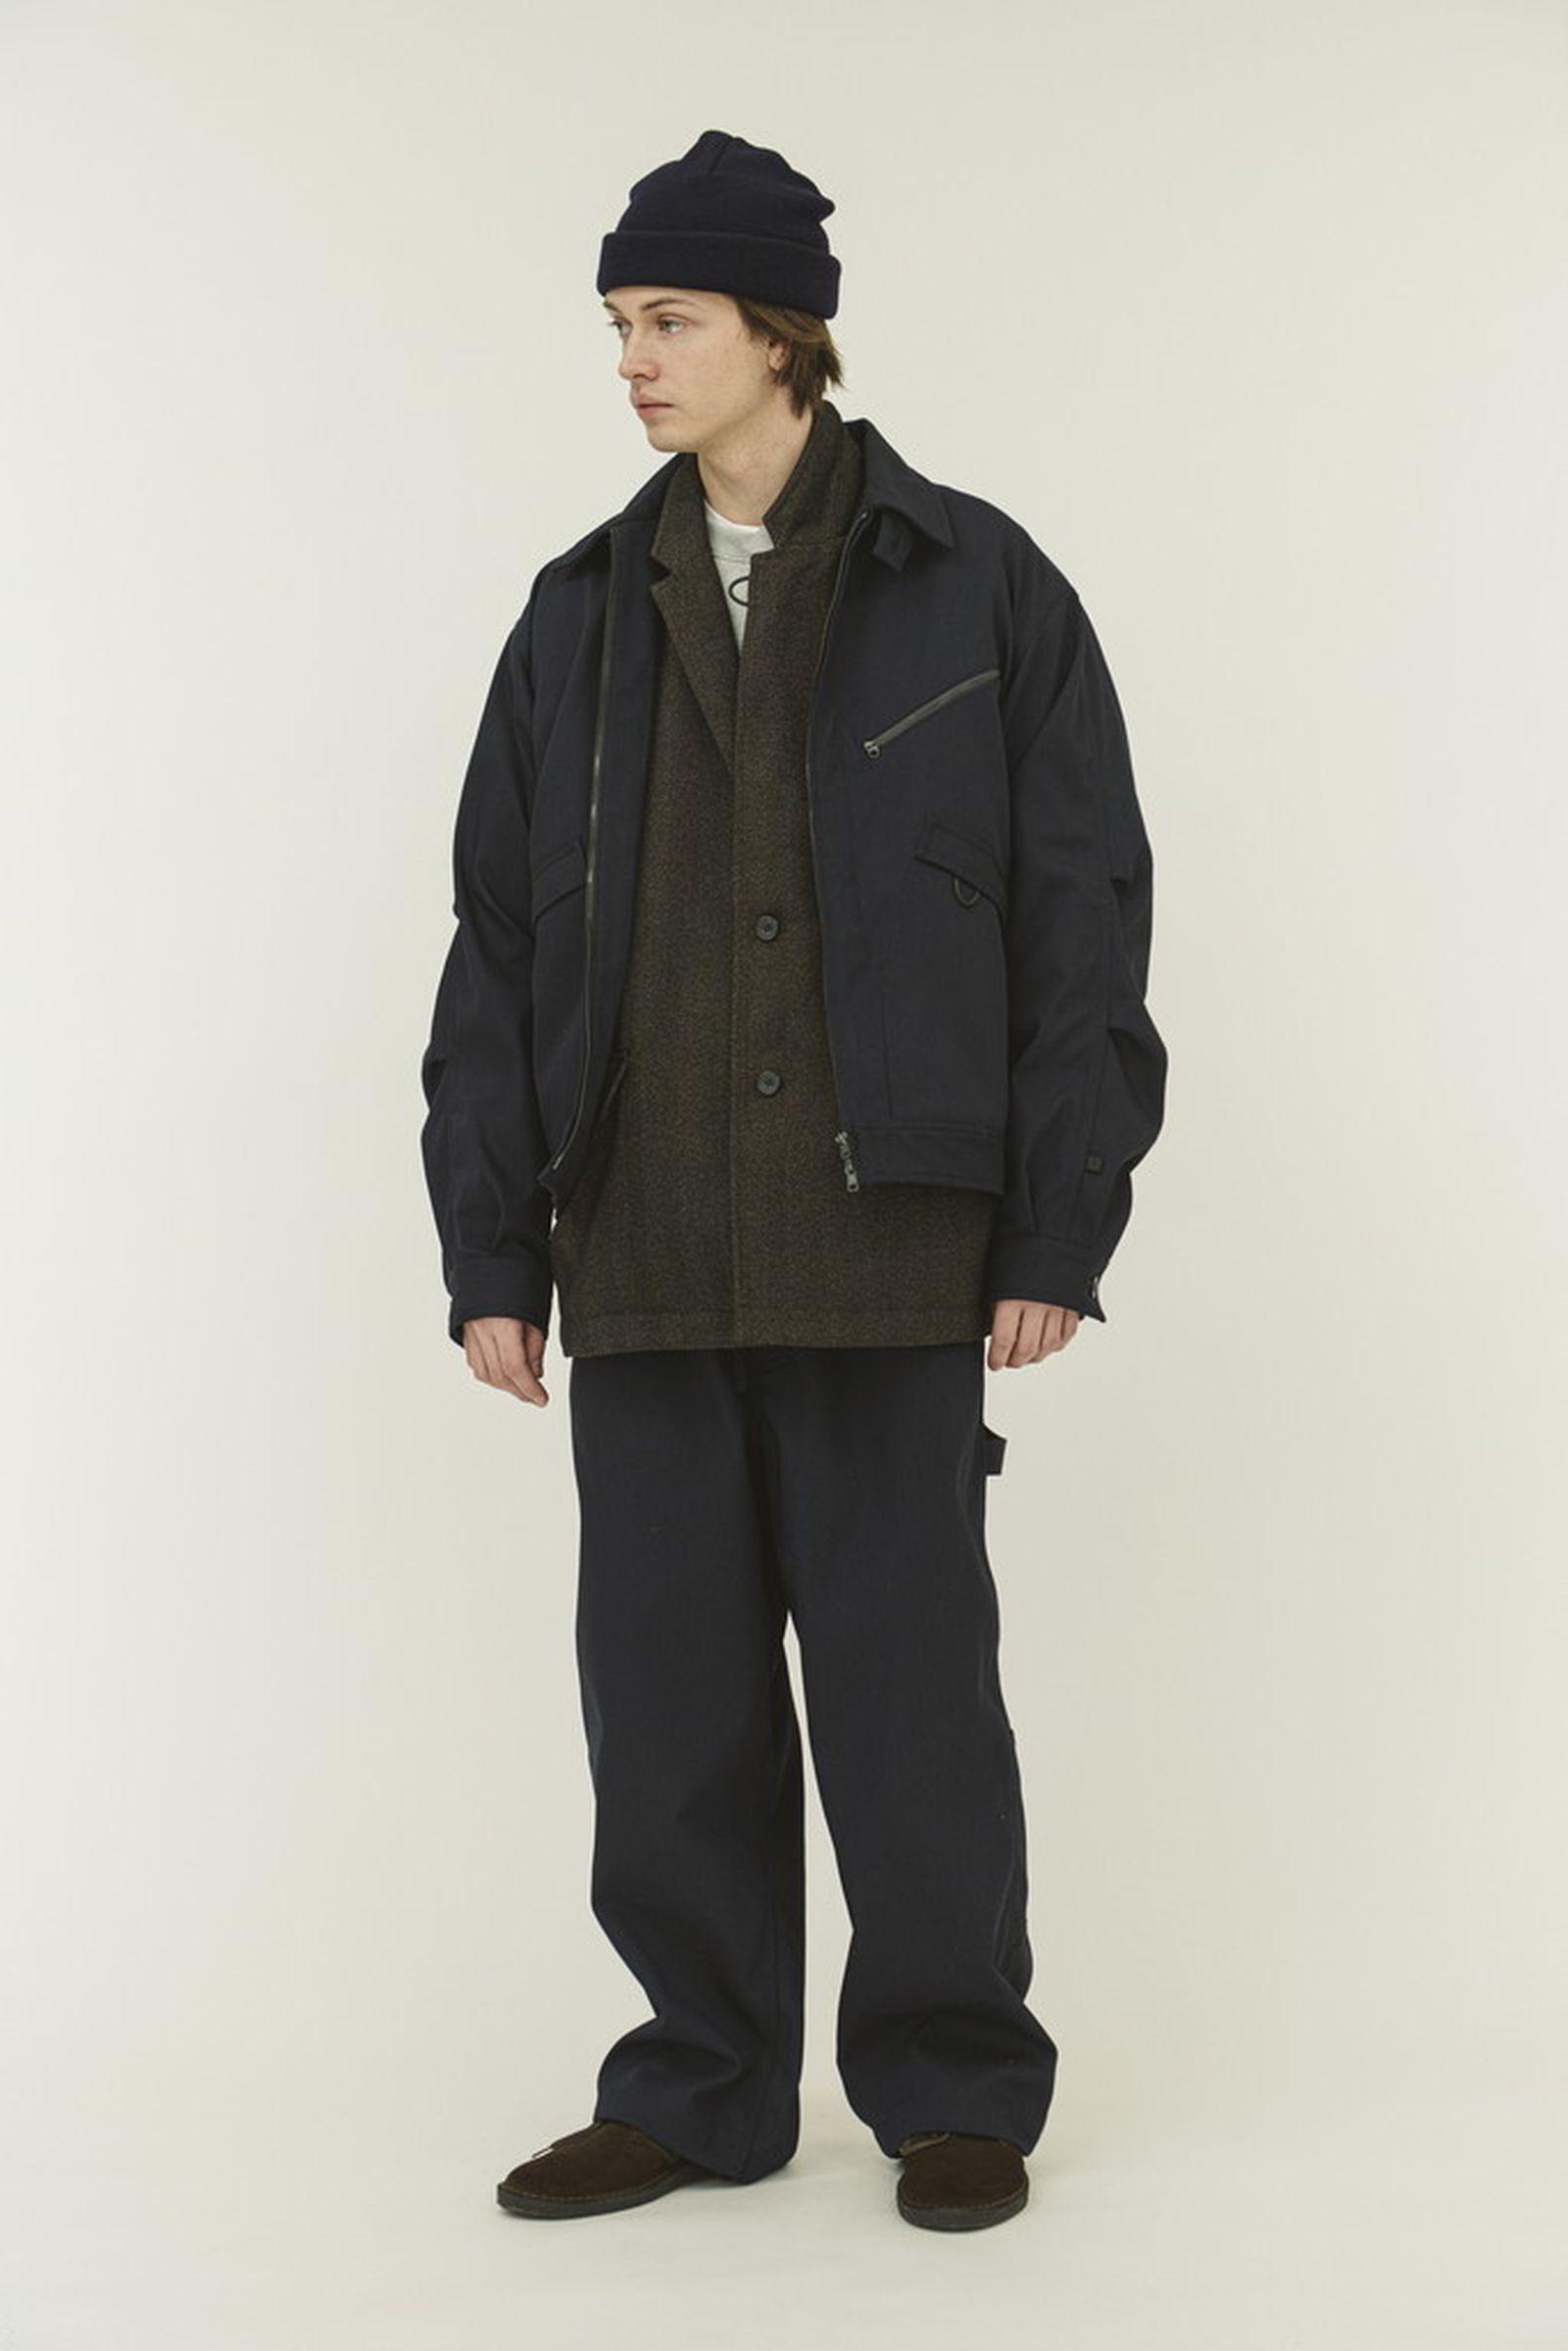 daiwa-pier39-fall-winter-2021-collection-07